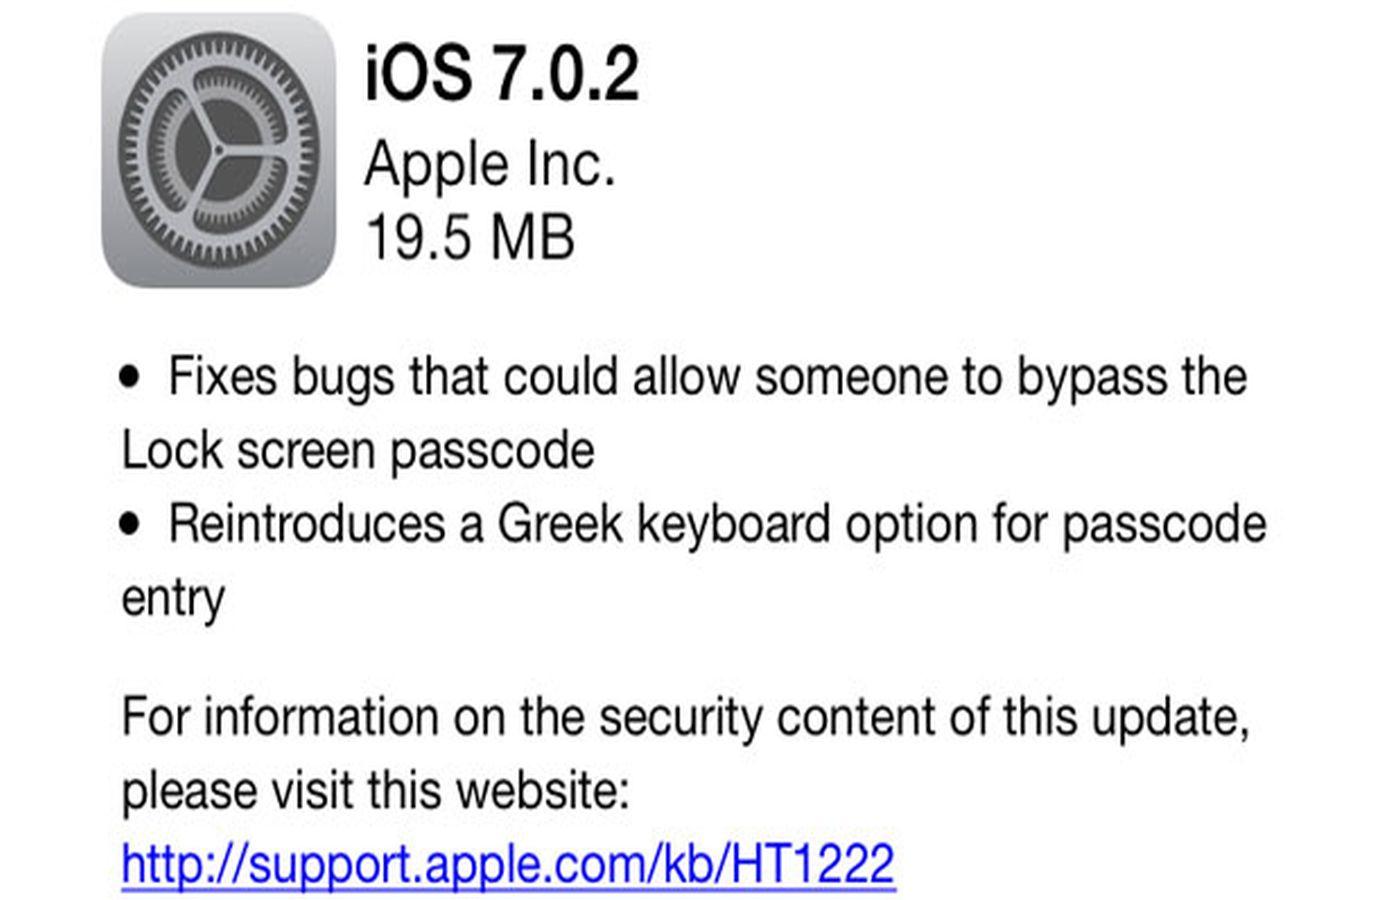 Apple Fixes Lockscreen Bypass Bug With iOS 7.0.2